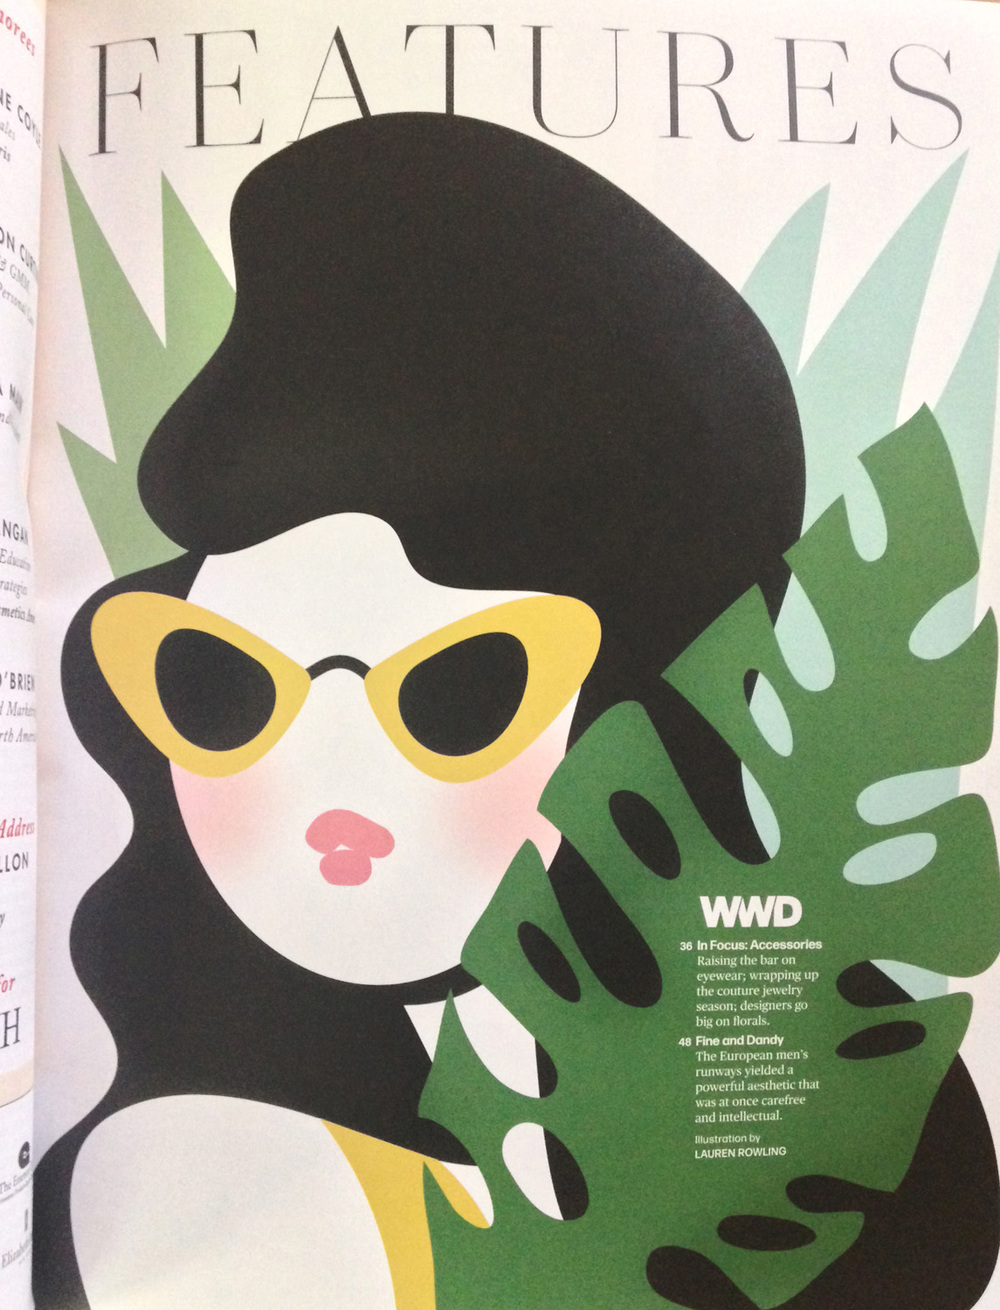 WWDmagazineRolwingLauren.jpg